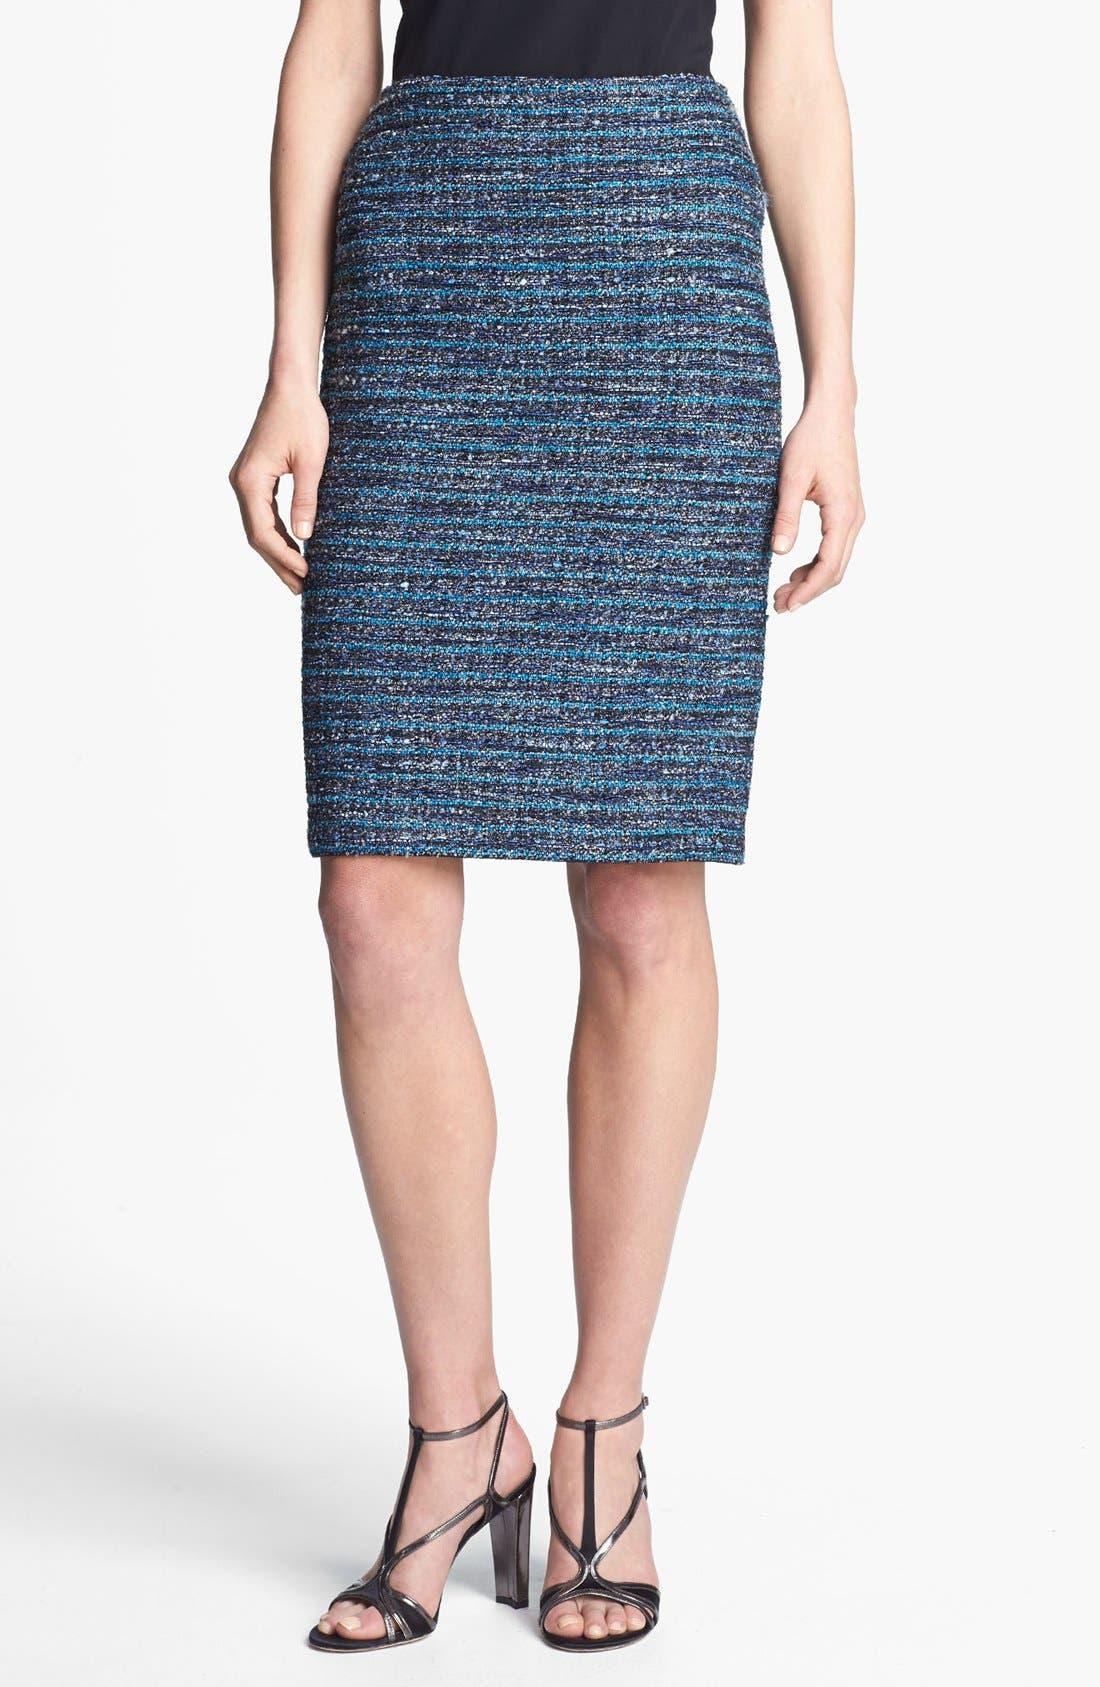 Alternate Image 1 Selected - St. John Collection Organza Ribbon Tweed Pencil Skirt